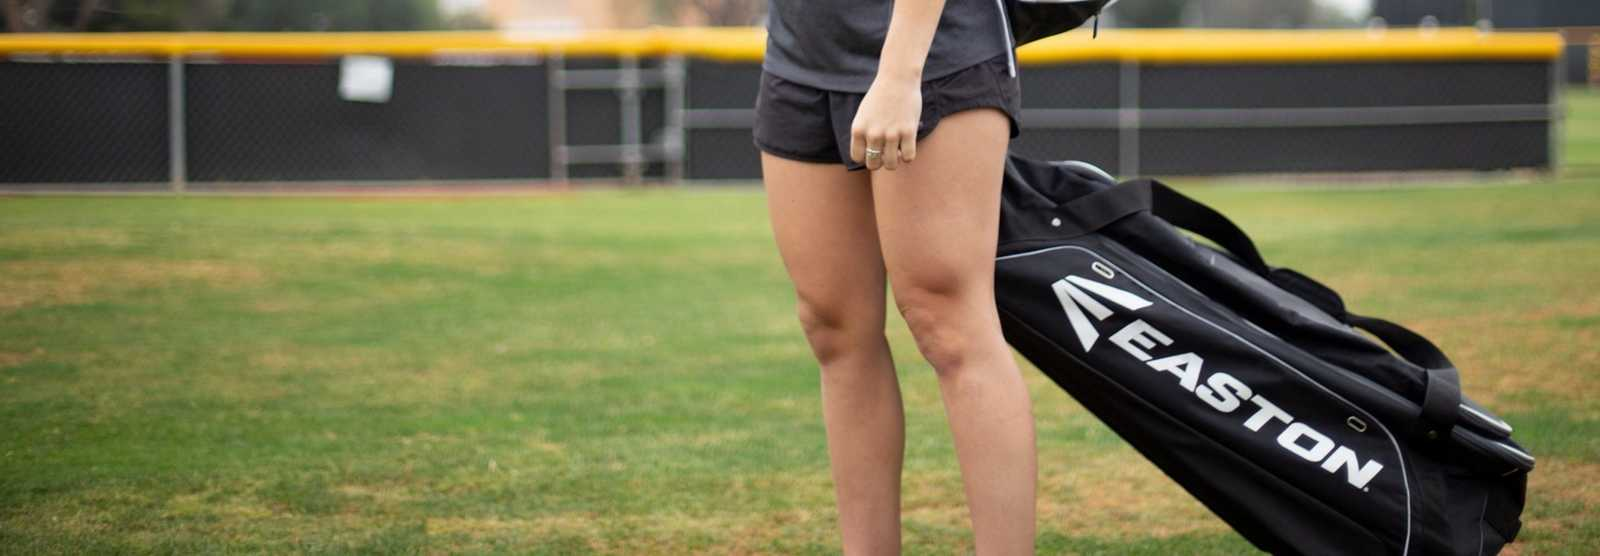 fastpitch-softball-wheeled-bags